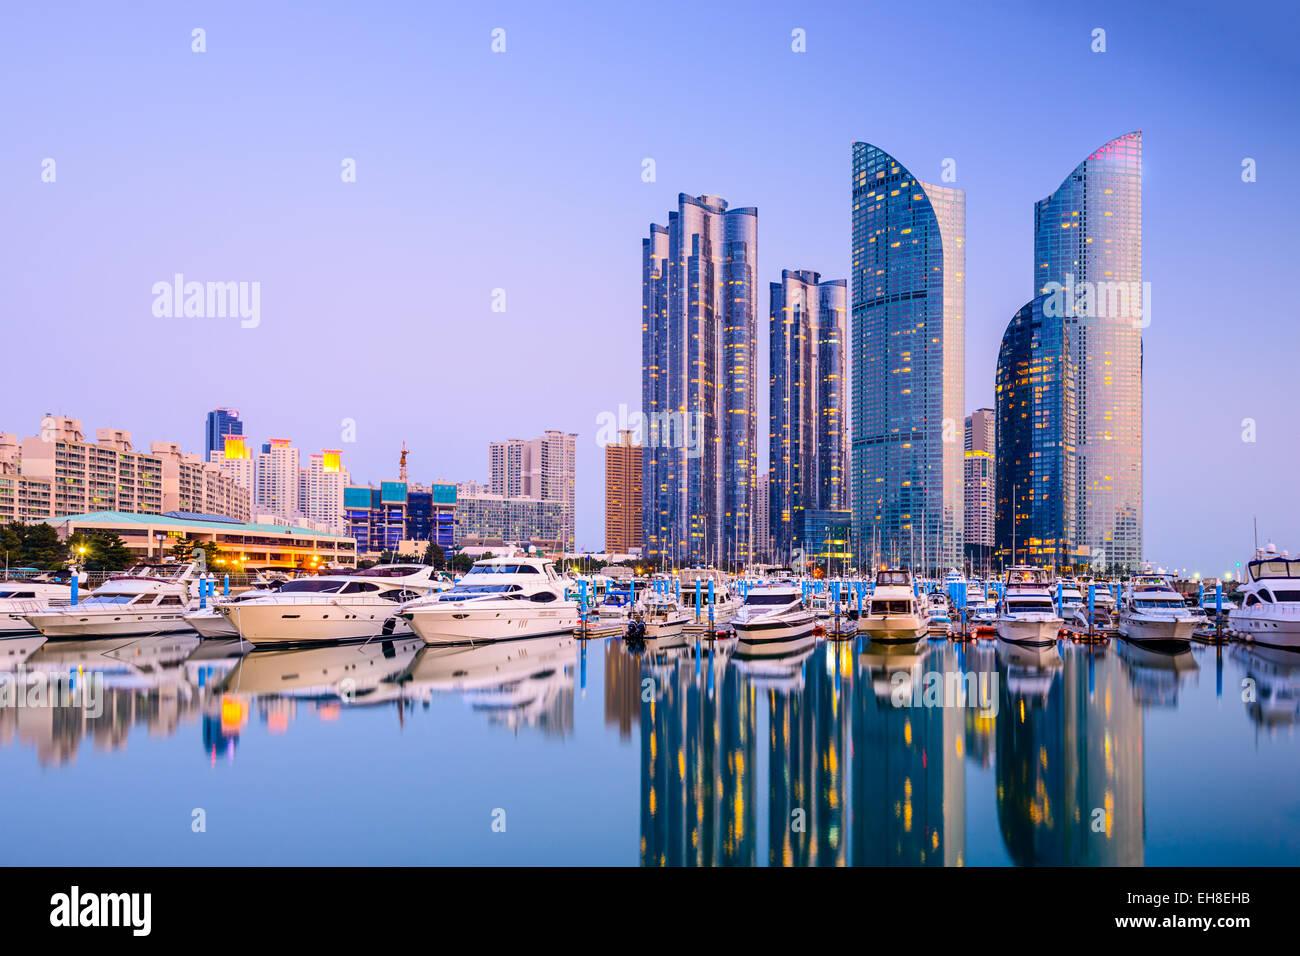 Busan, South Korea cityscape at Haeundae. - Stock Image